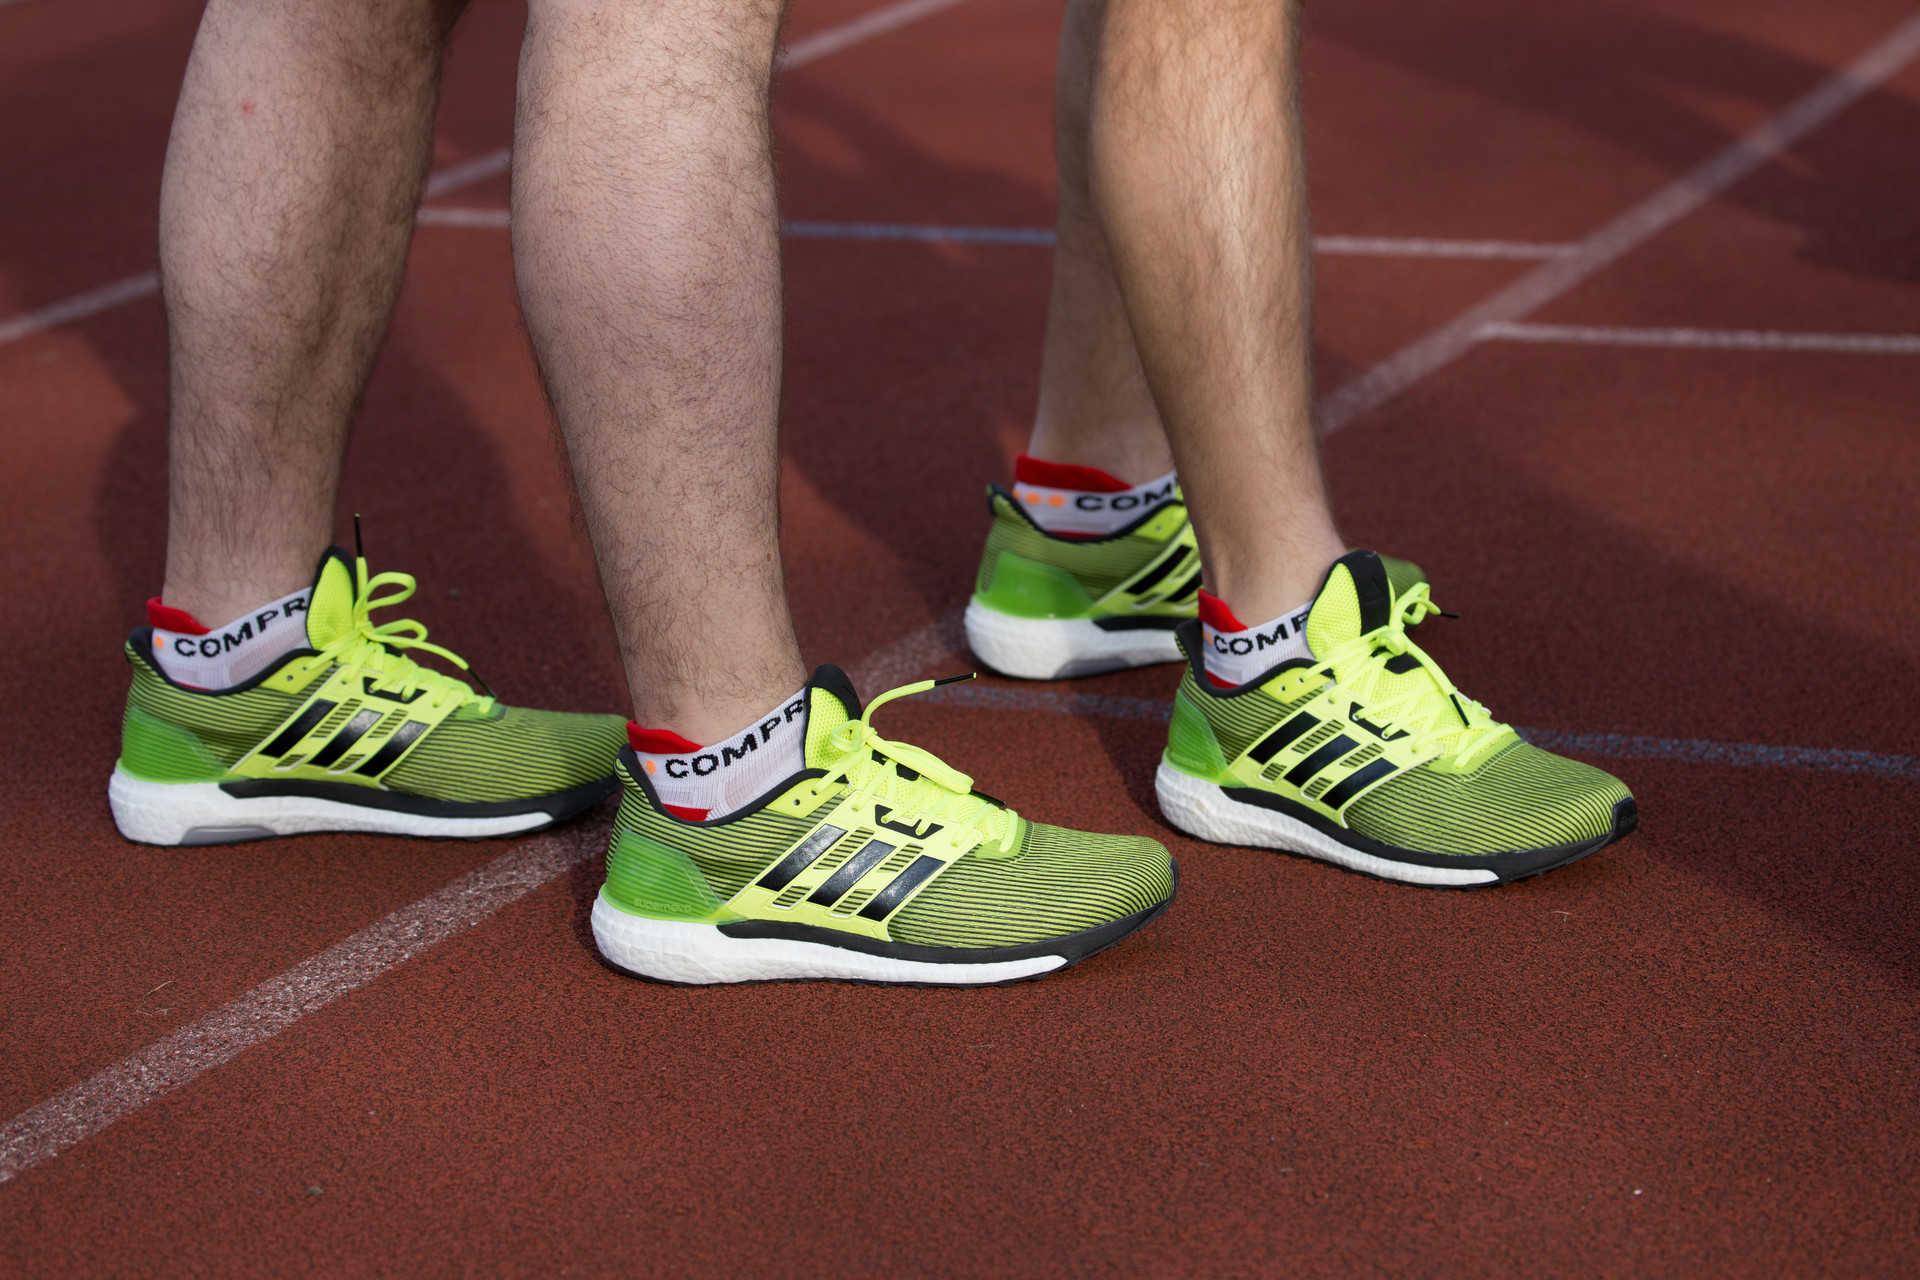 8dac864f3f10b Běžecké boty adidas SUPERNOVA